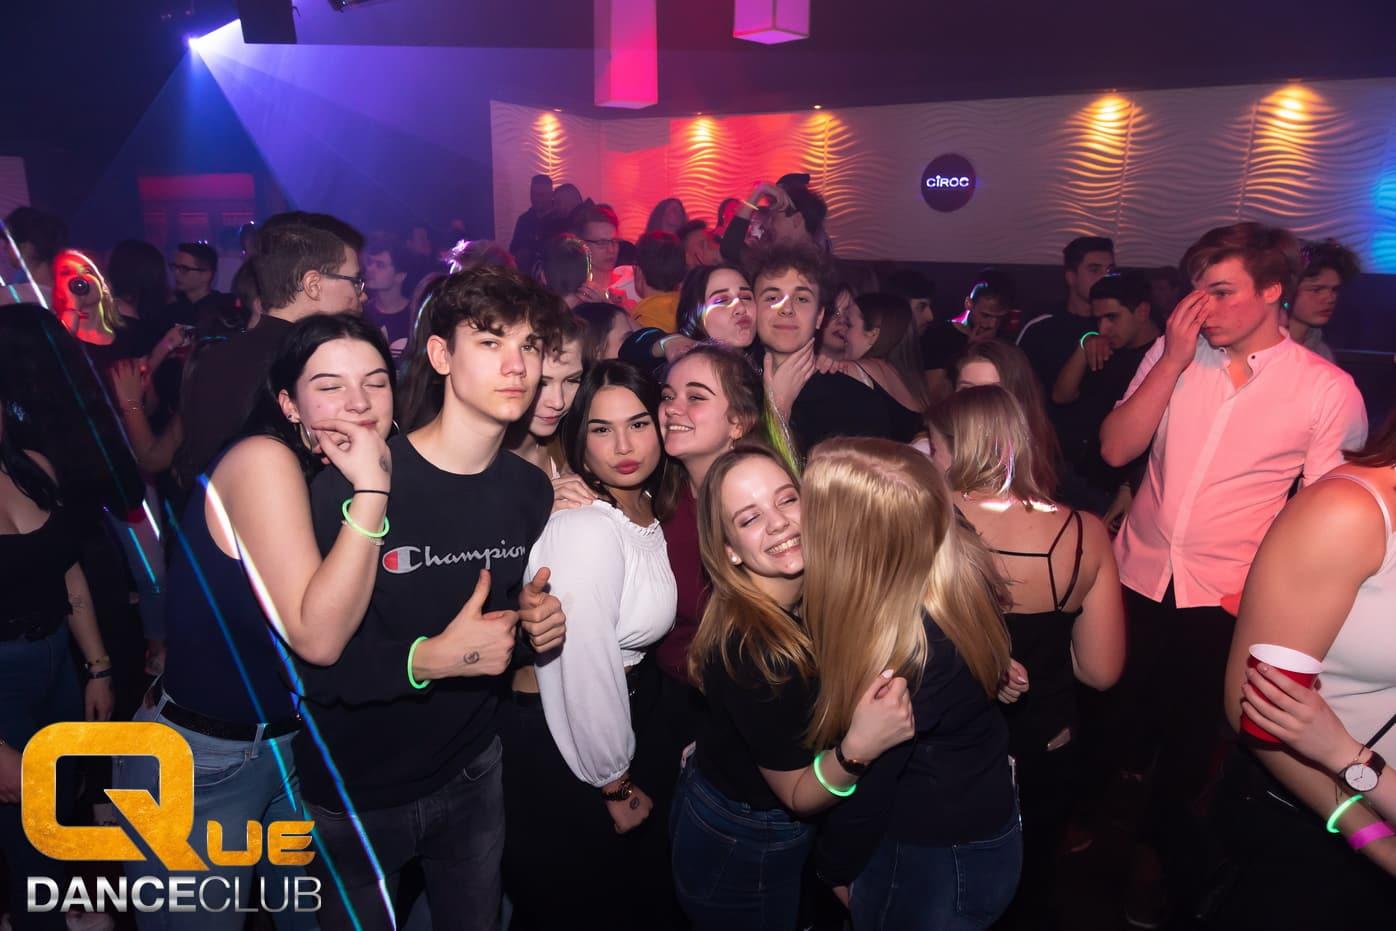 2019_02_15_Que_Danceclub_Secret_Kiss_Nightlife_Scene_Timo_031